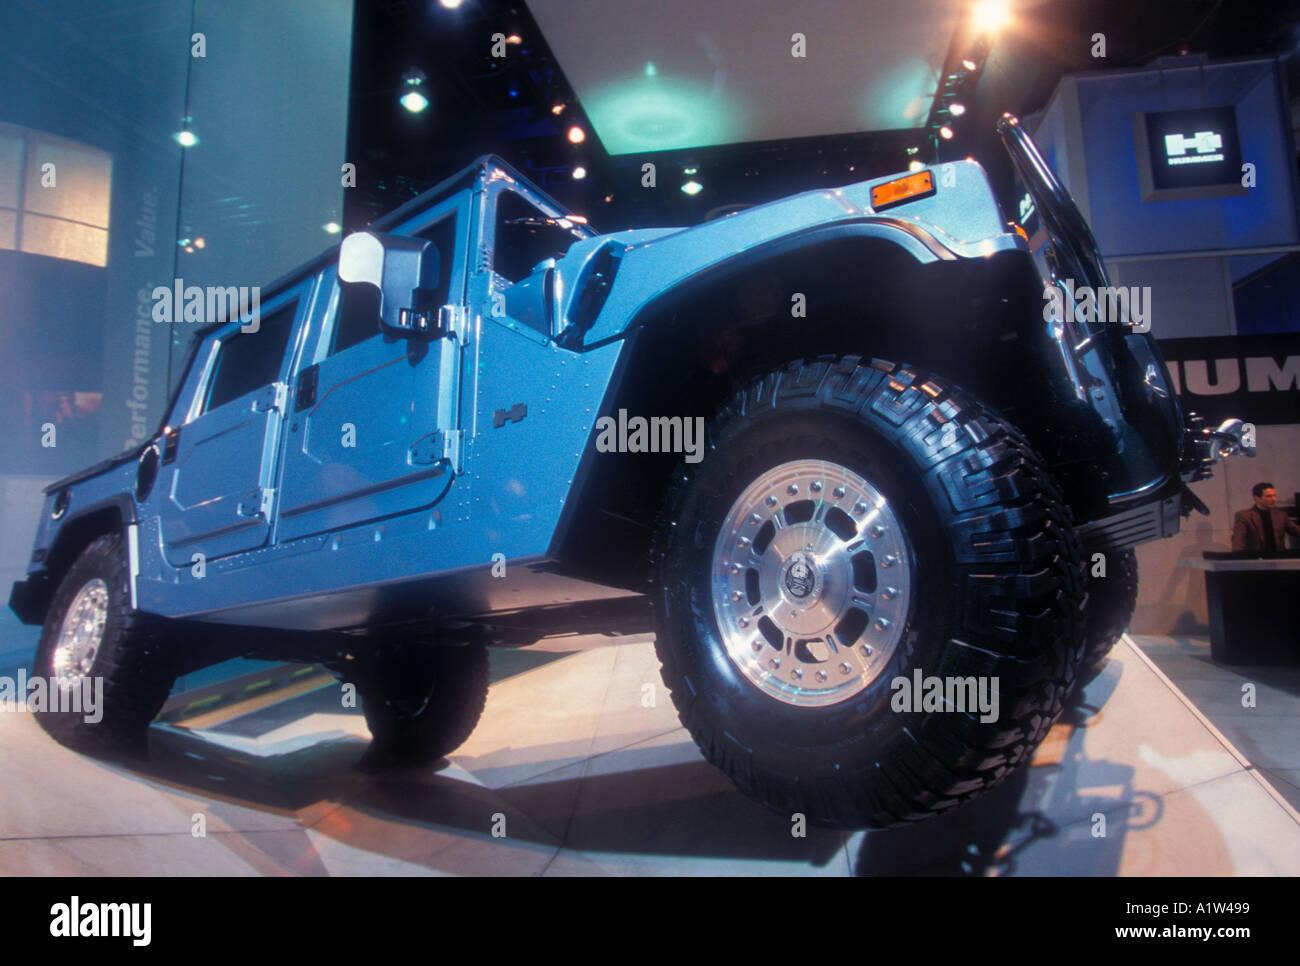 Detroit Michigan General Motors Hummer on display at the North American International Auto Show - Stock Image